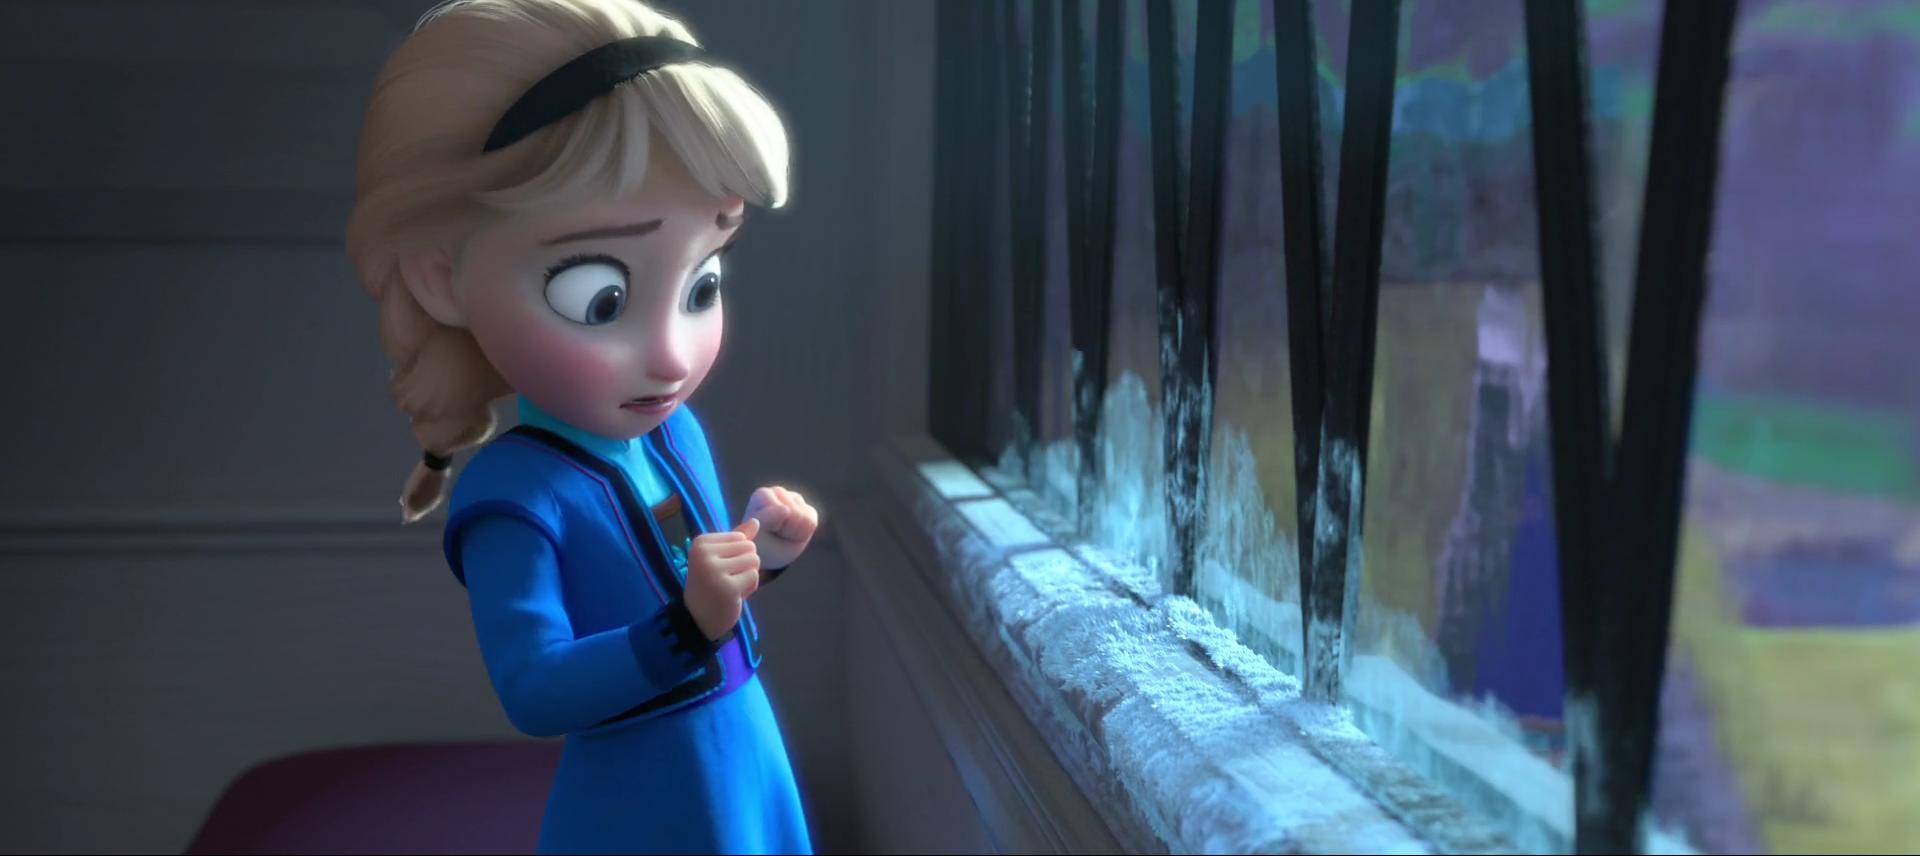 Frozen's Elsa as Trans Woman Representation